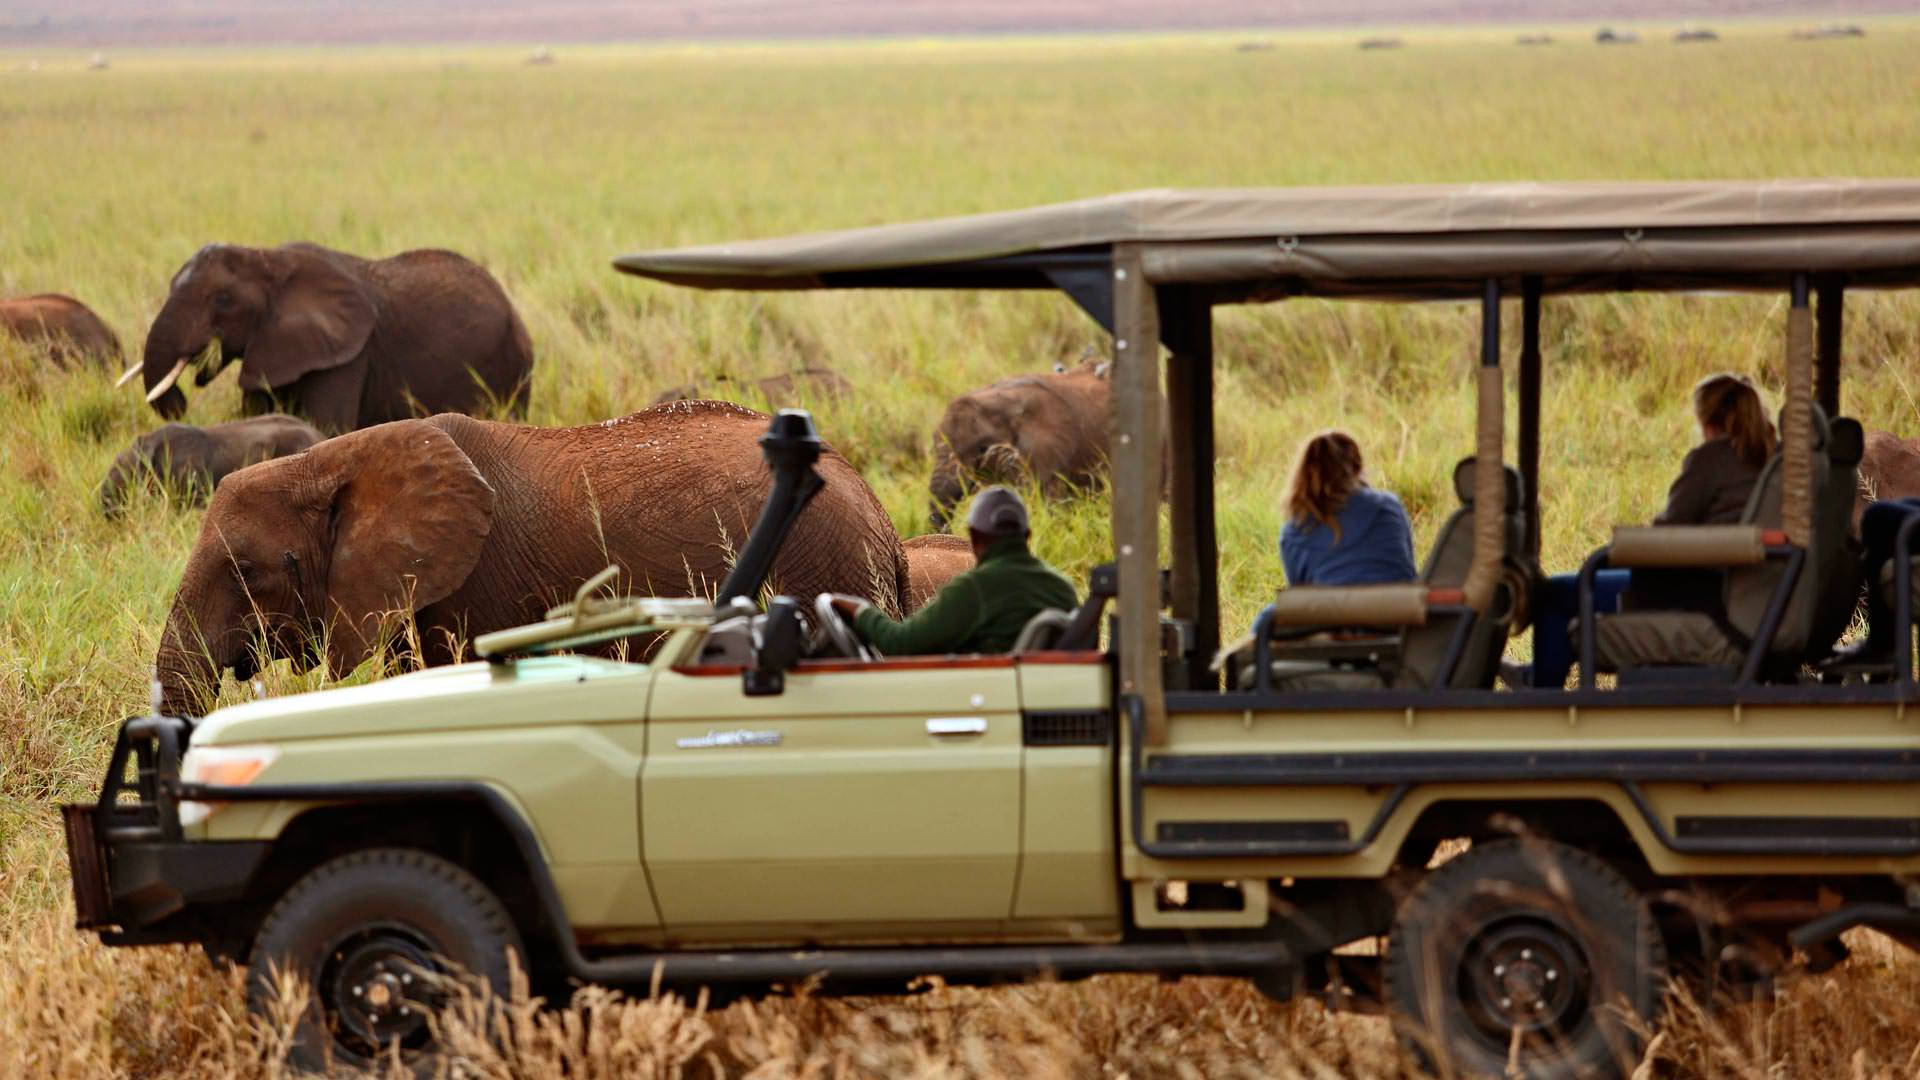 Viewing elephants